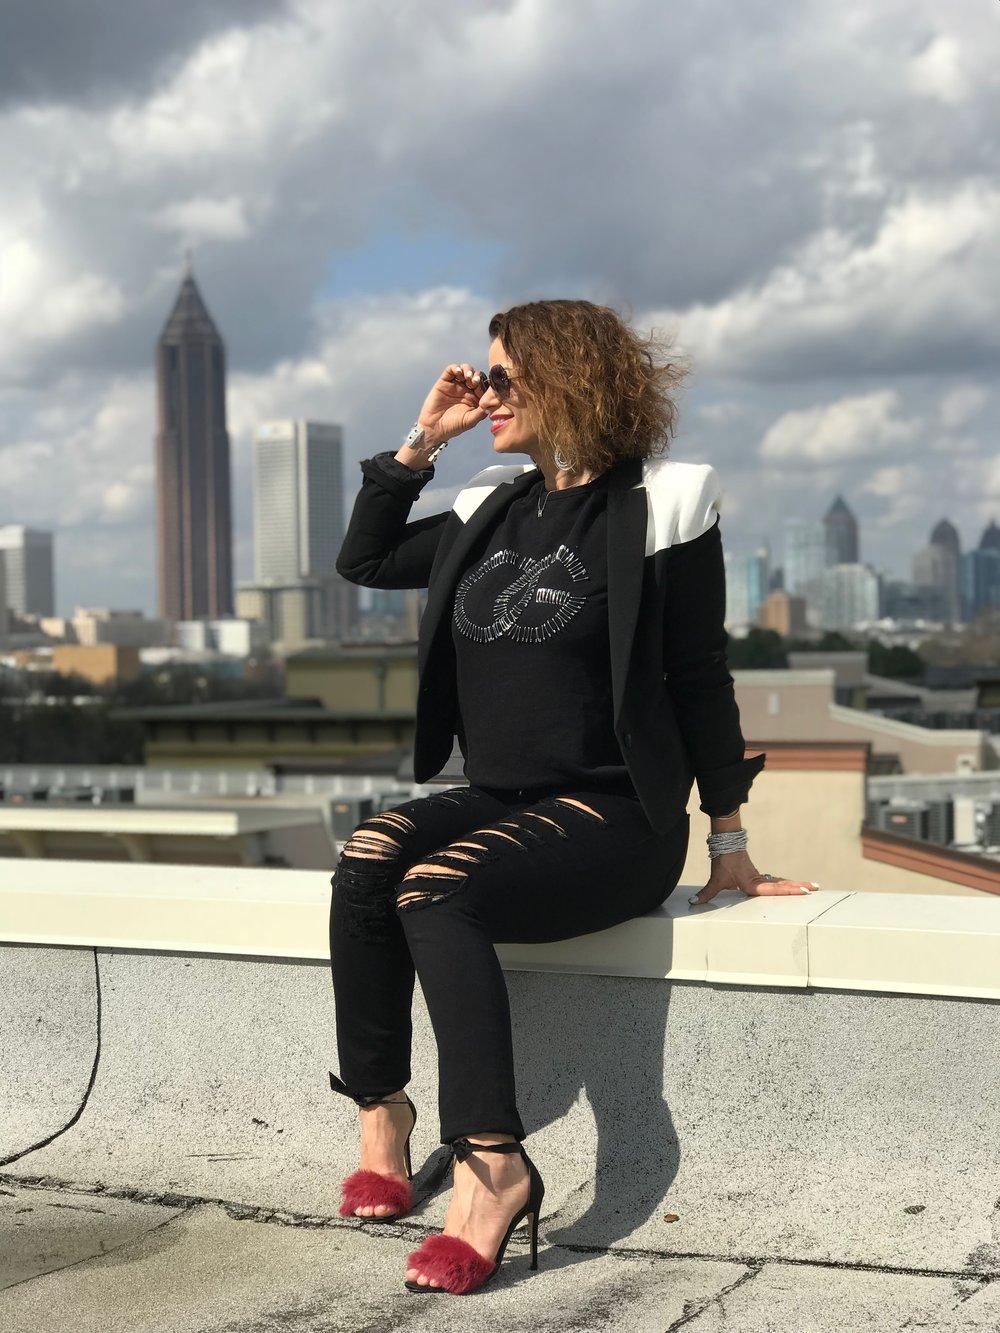 Meet Holly, sharpening the world's style through @hollykatzstyle